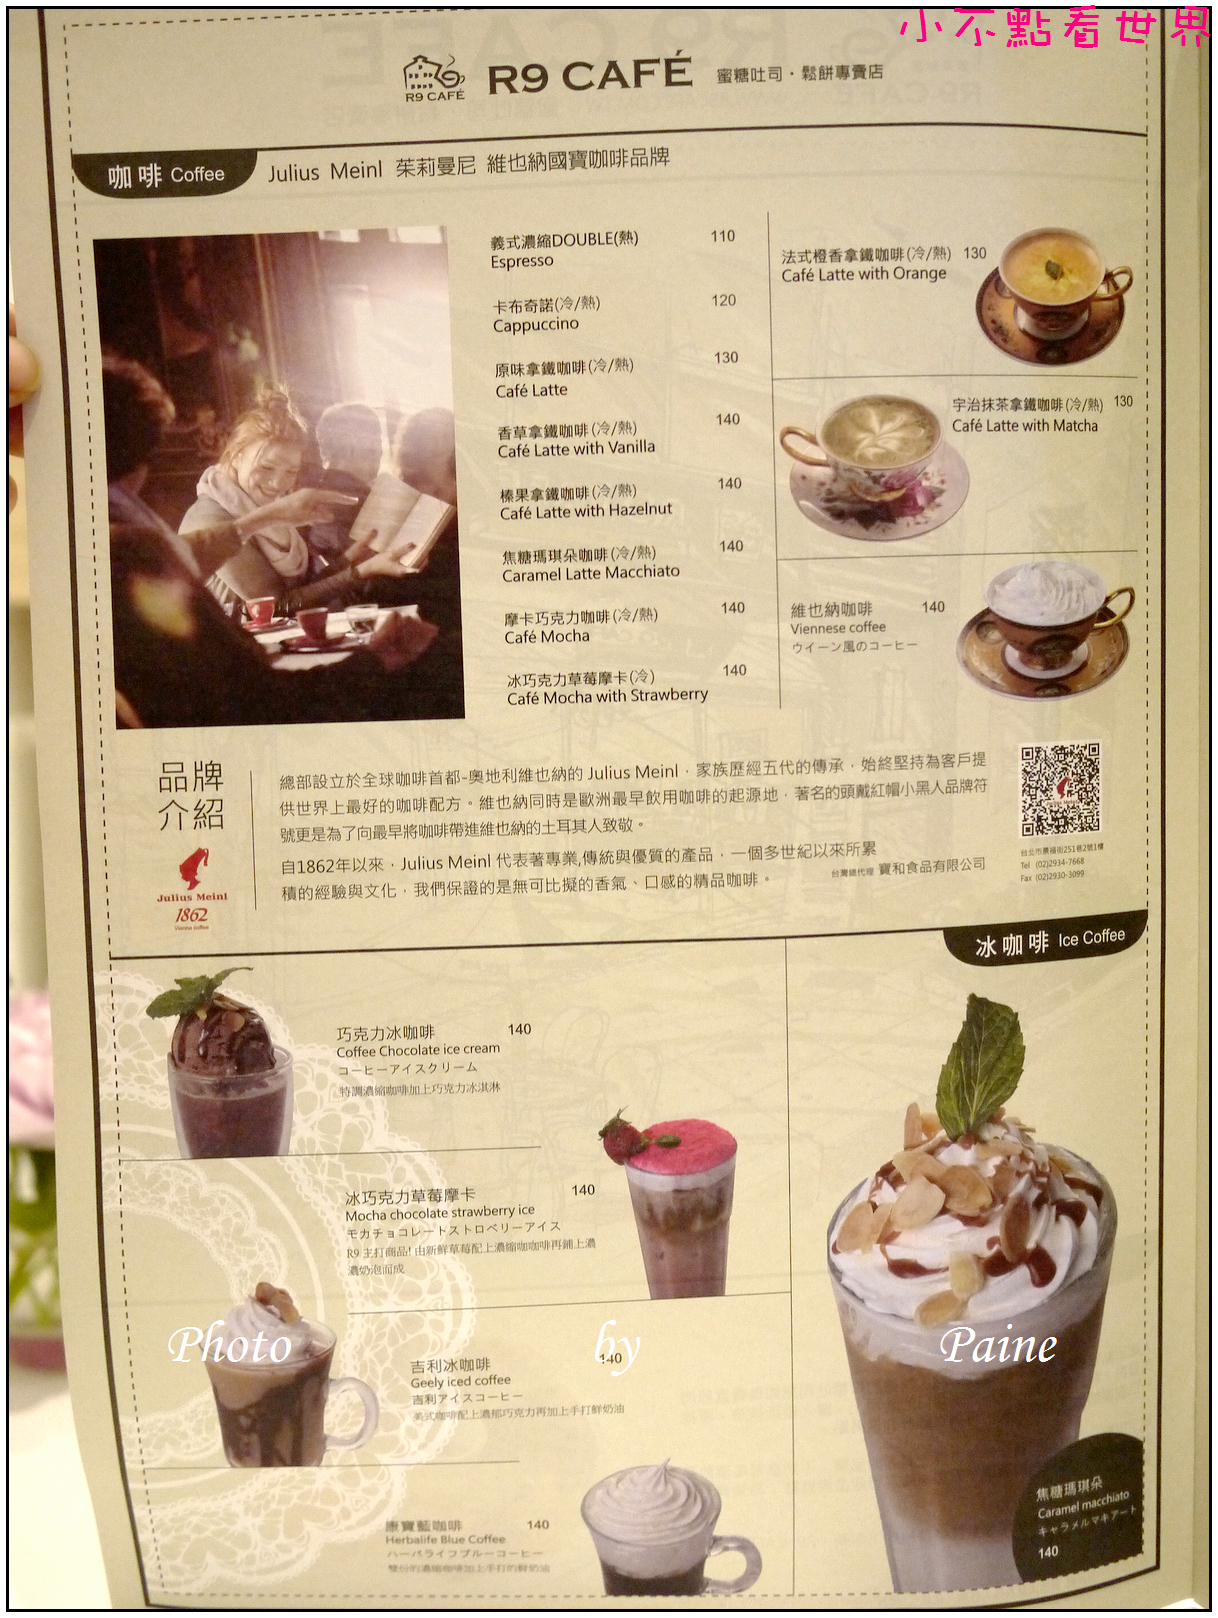 桃園R9 CAFE (15).JPG